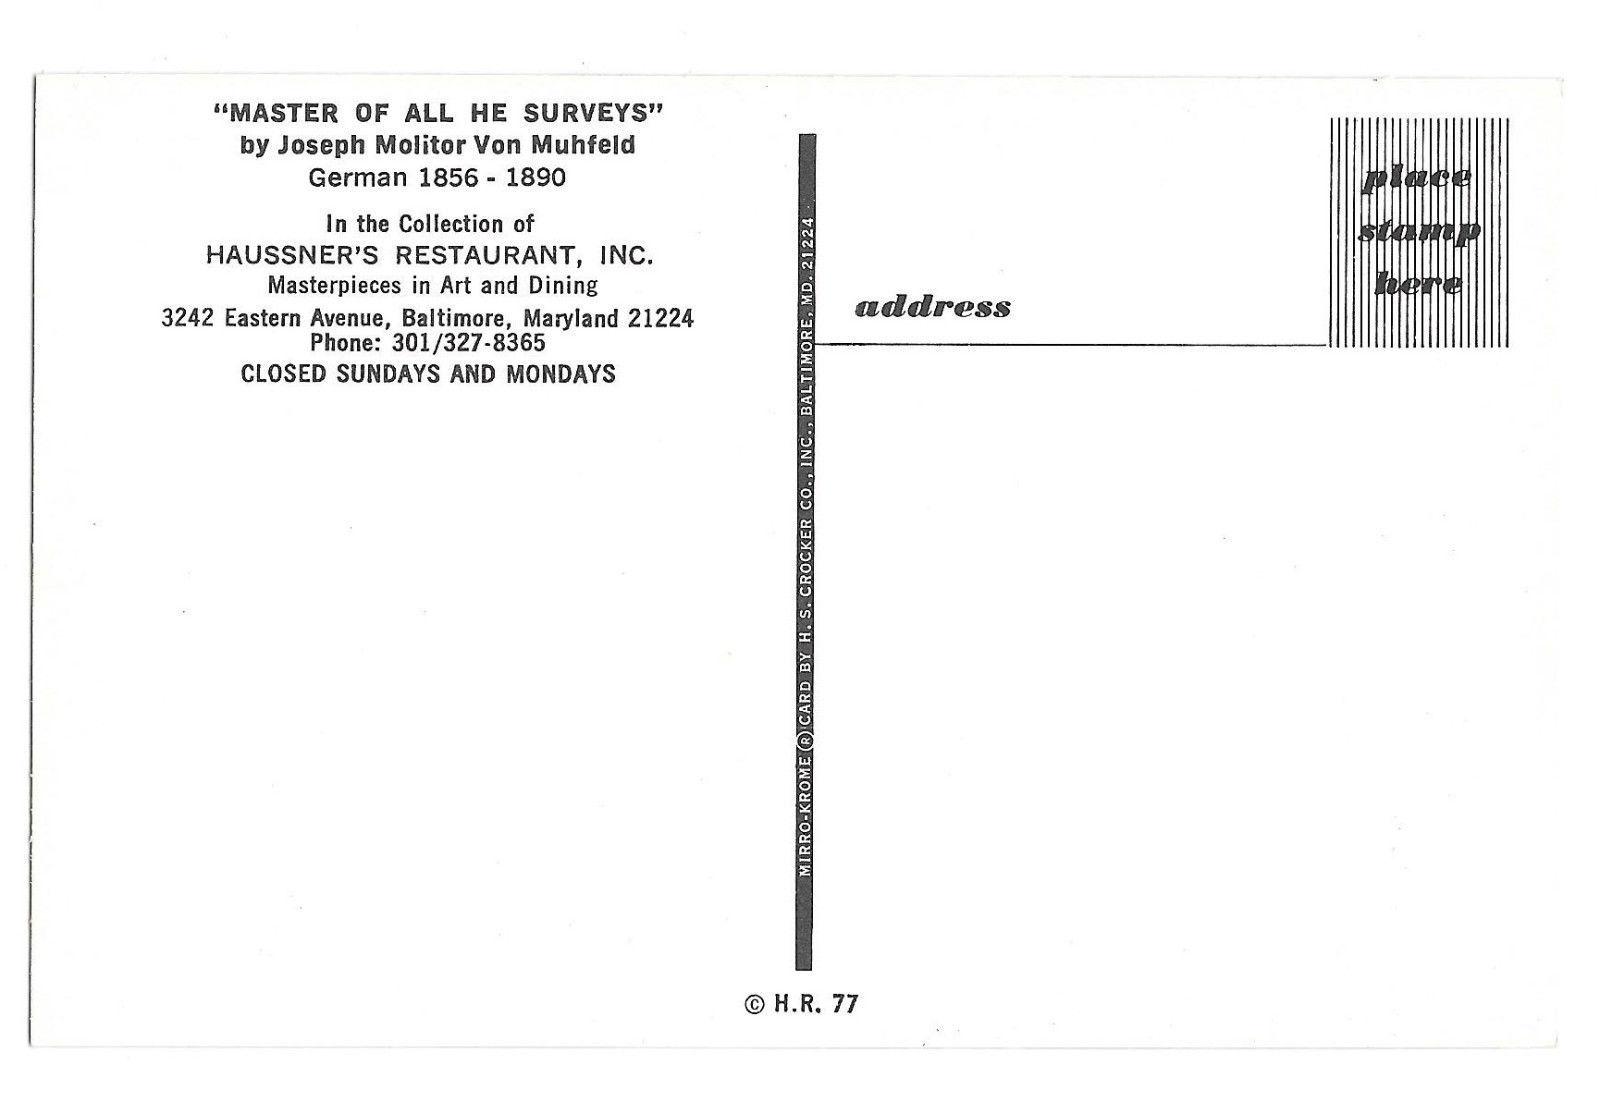 Master of All He Surveys Muhfeld Haussner's Restaurant Baltimore MD Vtg Postcard